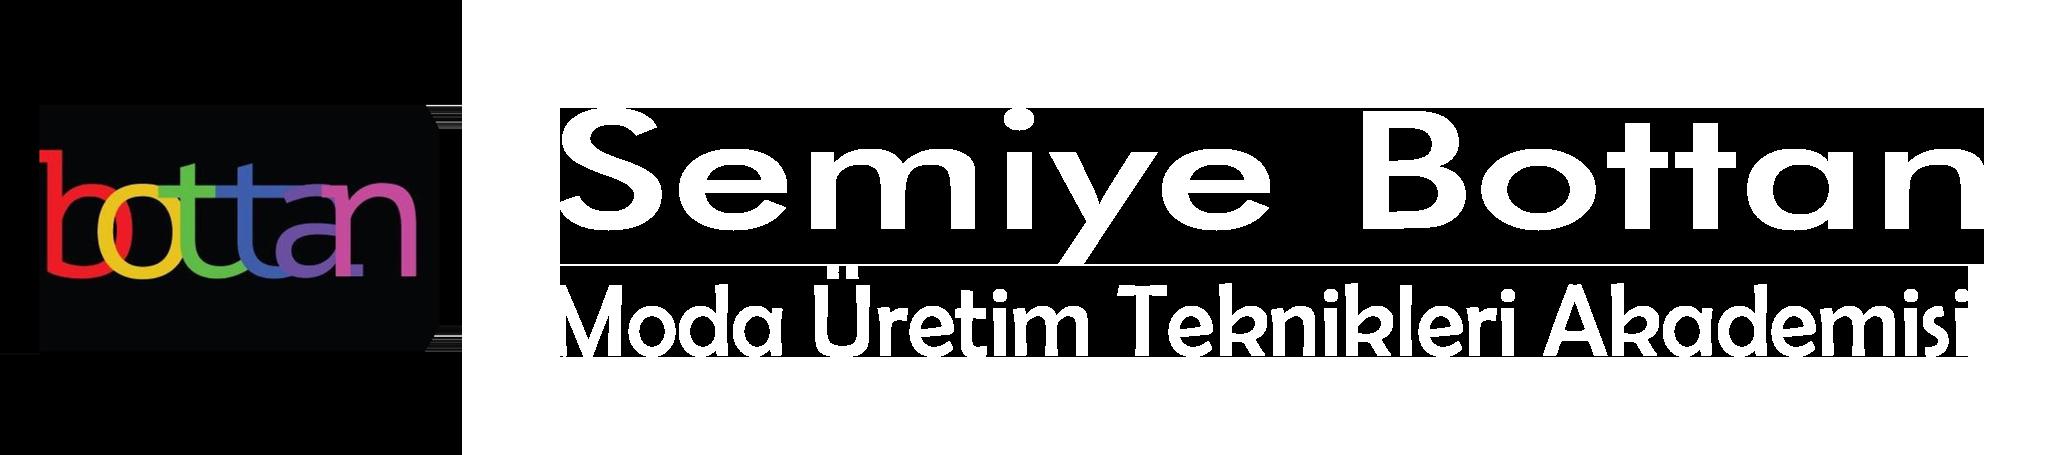 Semiye Bottan